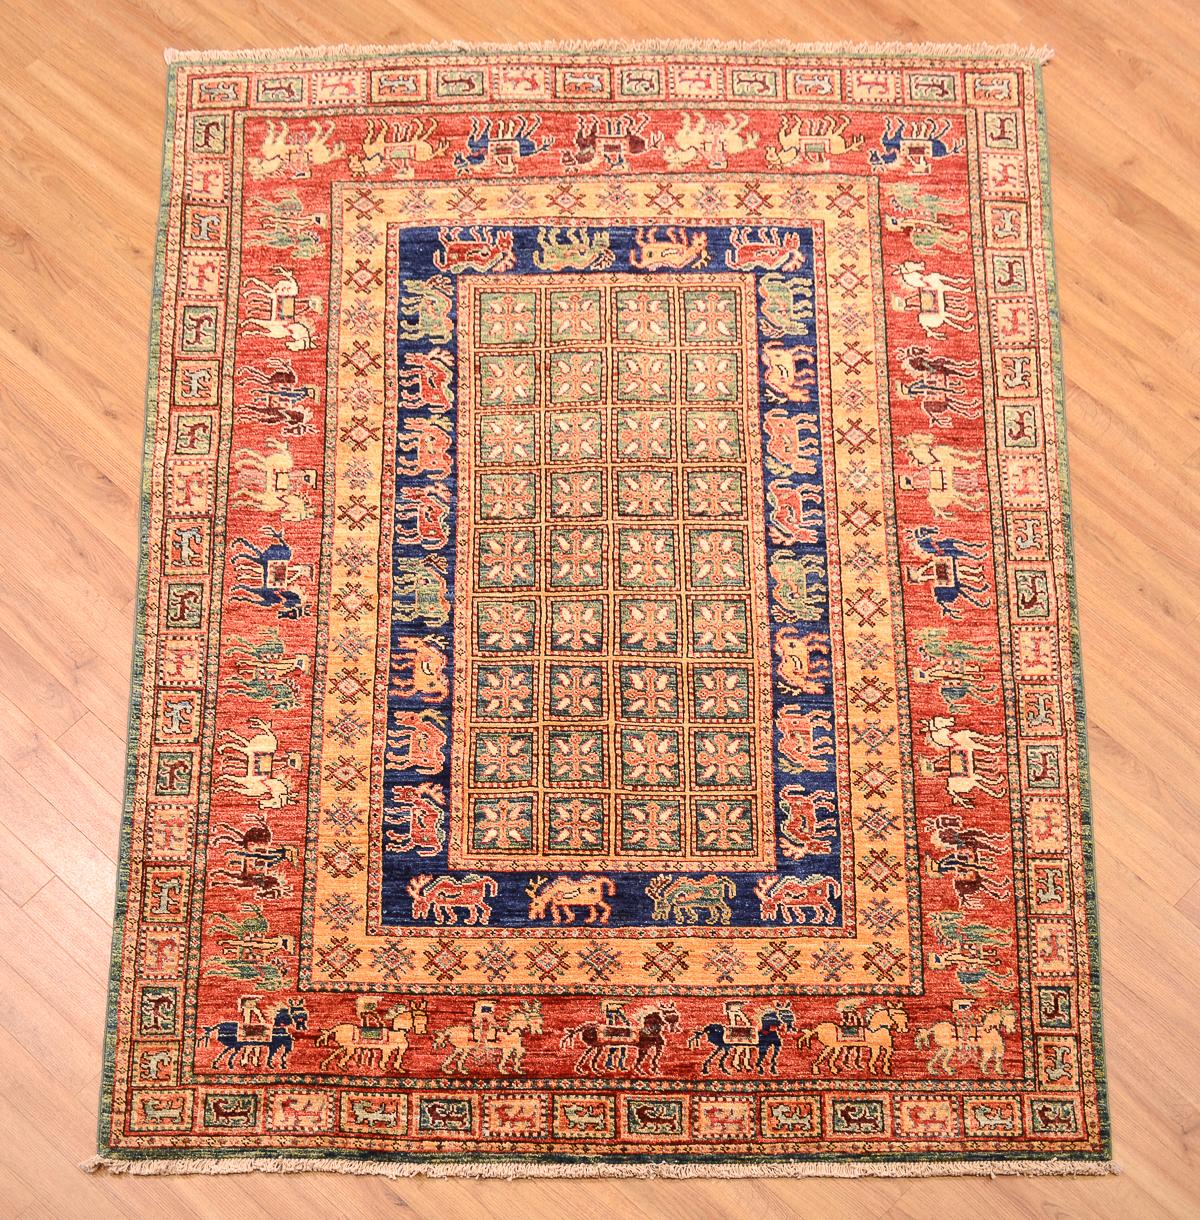 Afghan Pazyryk Rug 2 00x1 48m The Oriental Rug Merchant